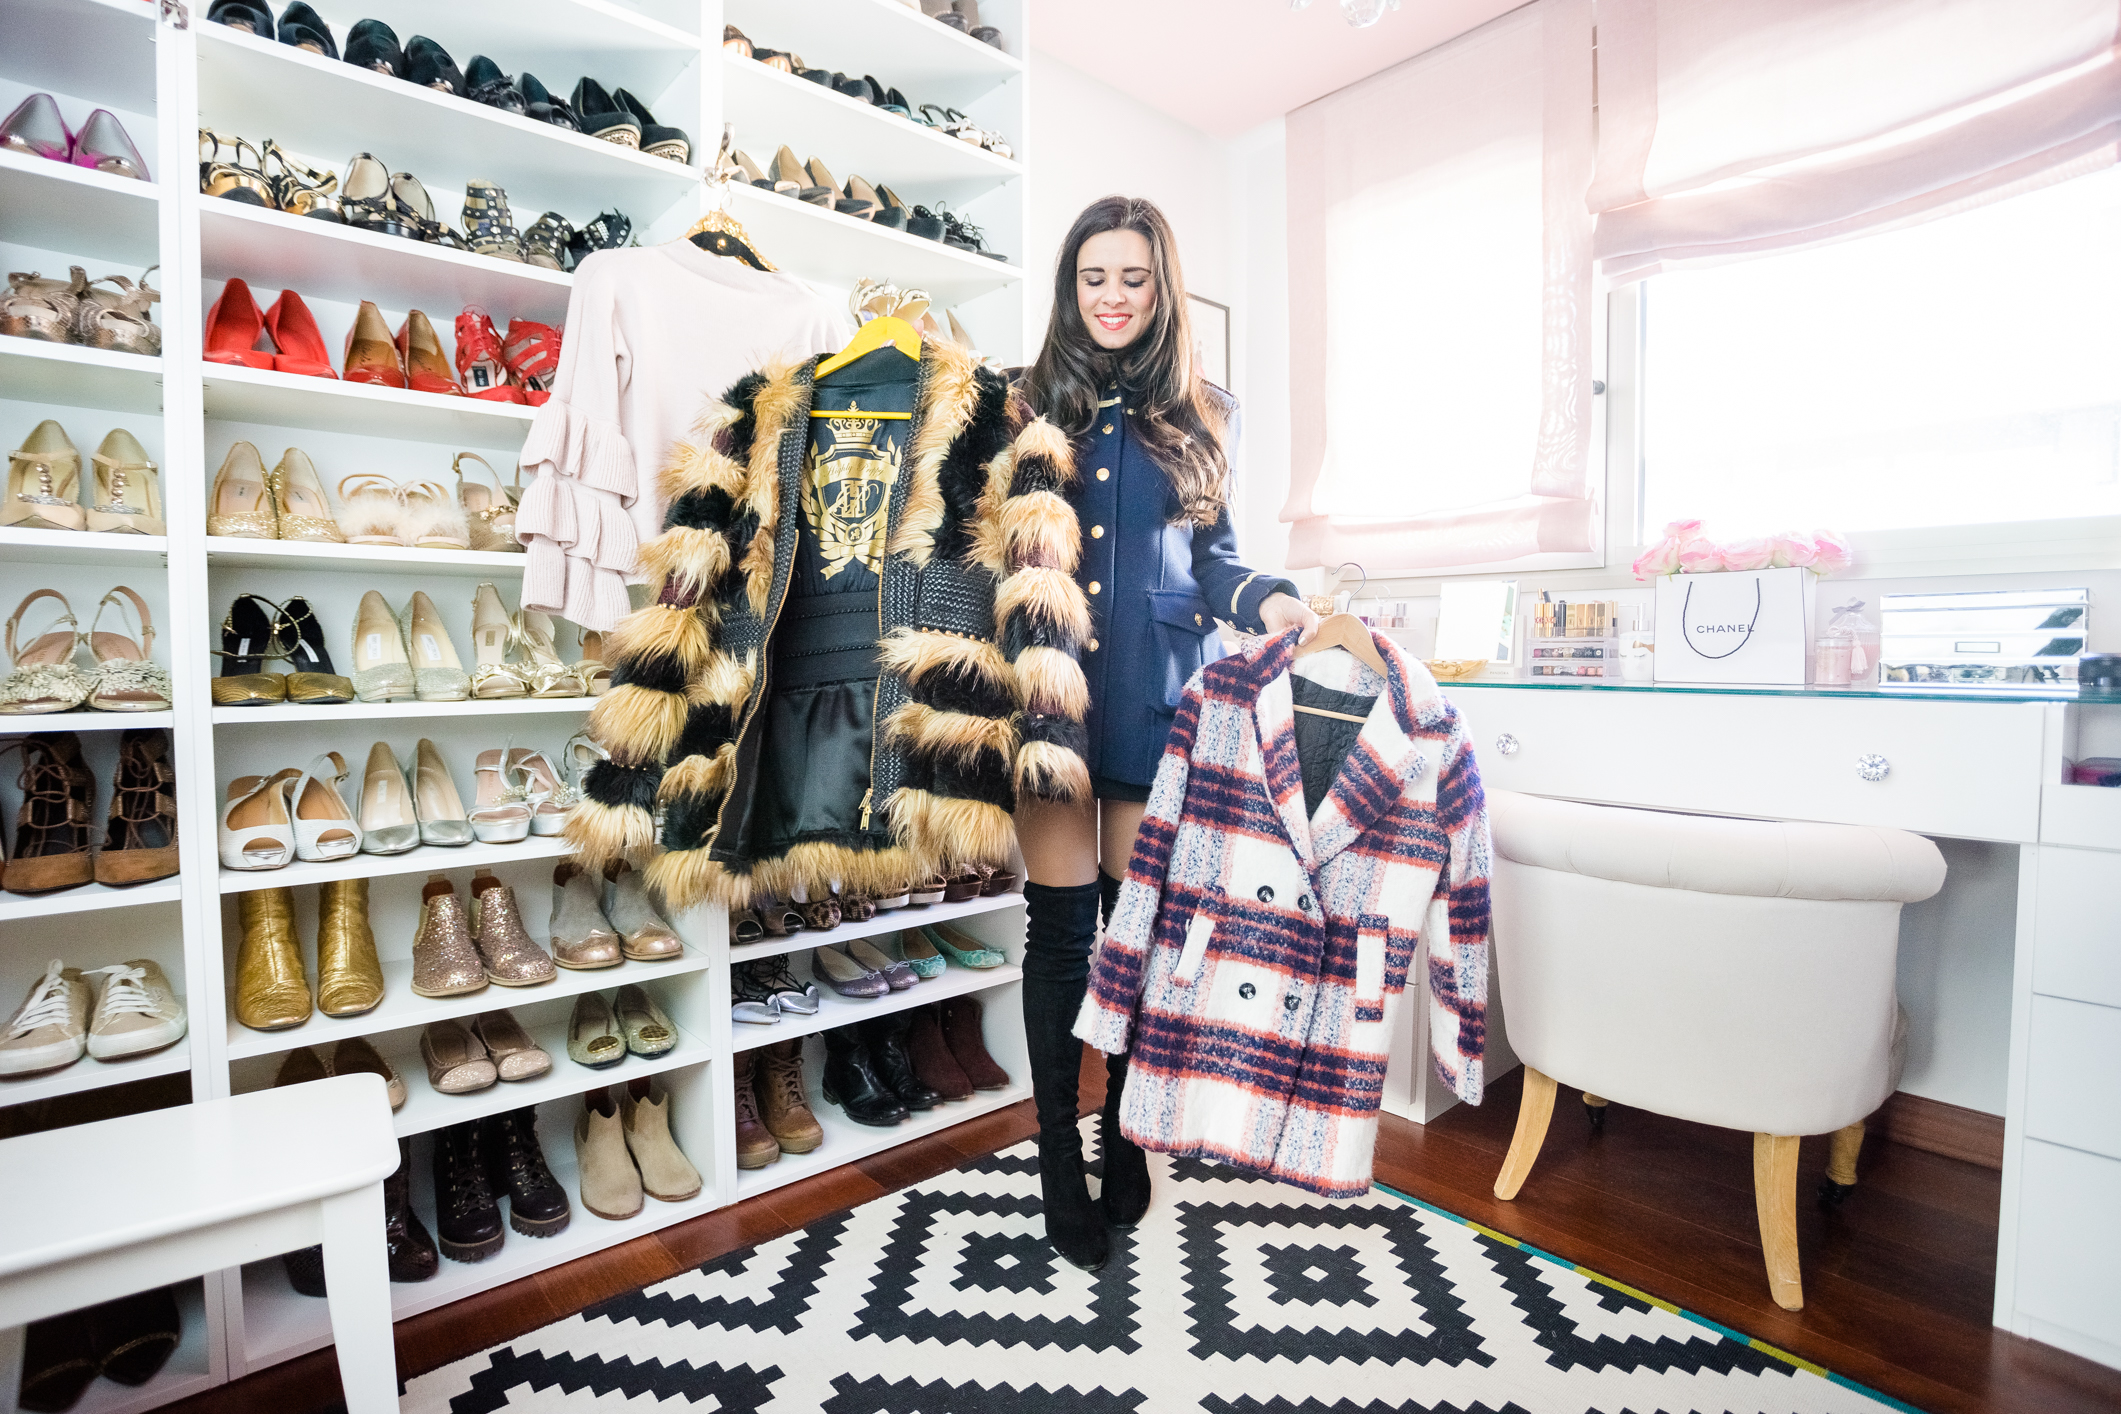 video tendencias moda invierno 2017 Crimenes de la moda blog Maria Jesus Garnica Navarro